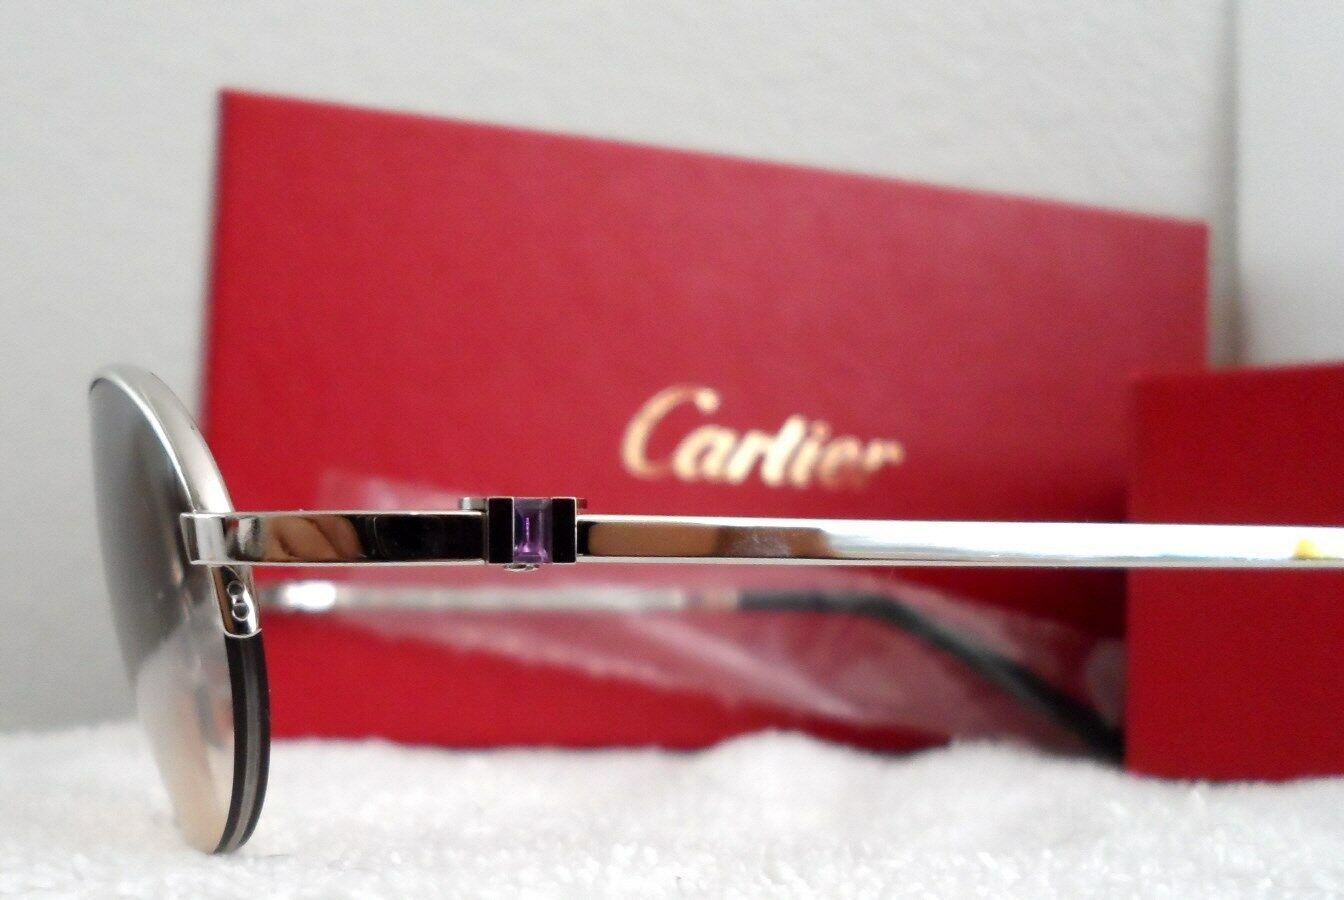 750cc49d7471 Authentic Cartier Semi Rimless  amethyst  Sunglasses Eyeglasses for ...